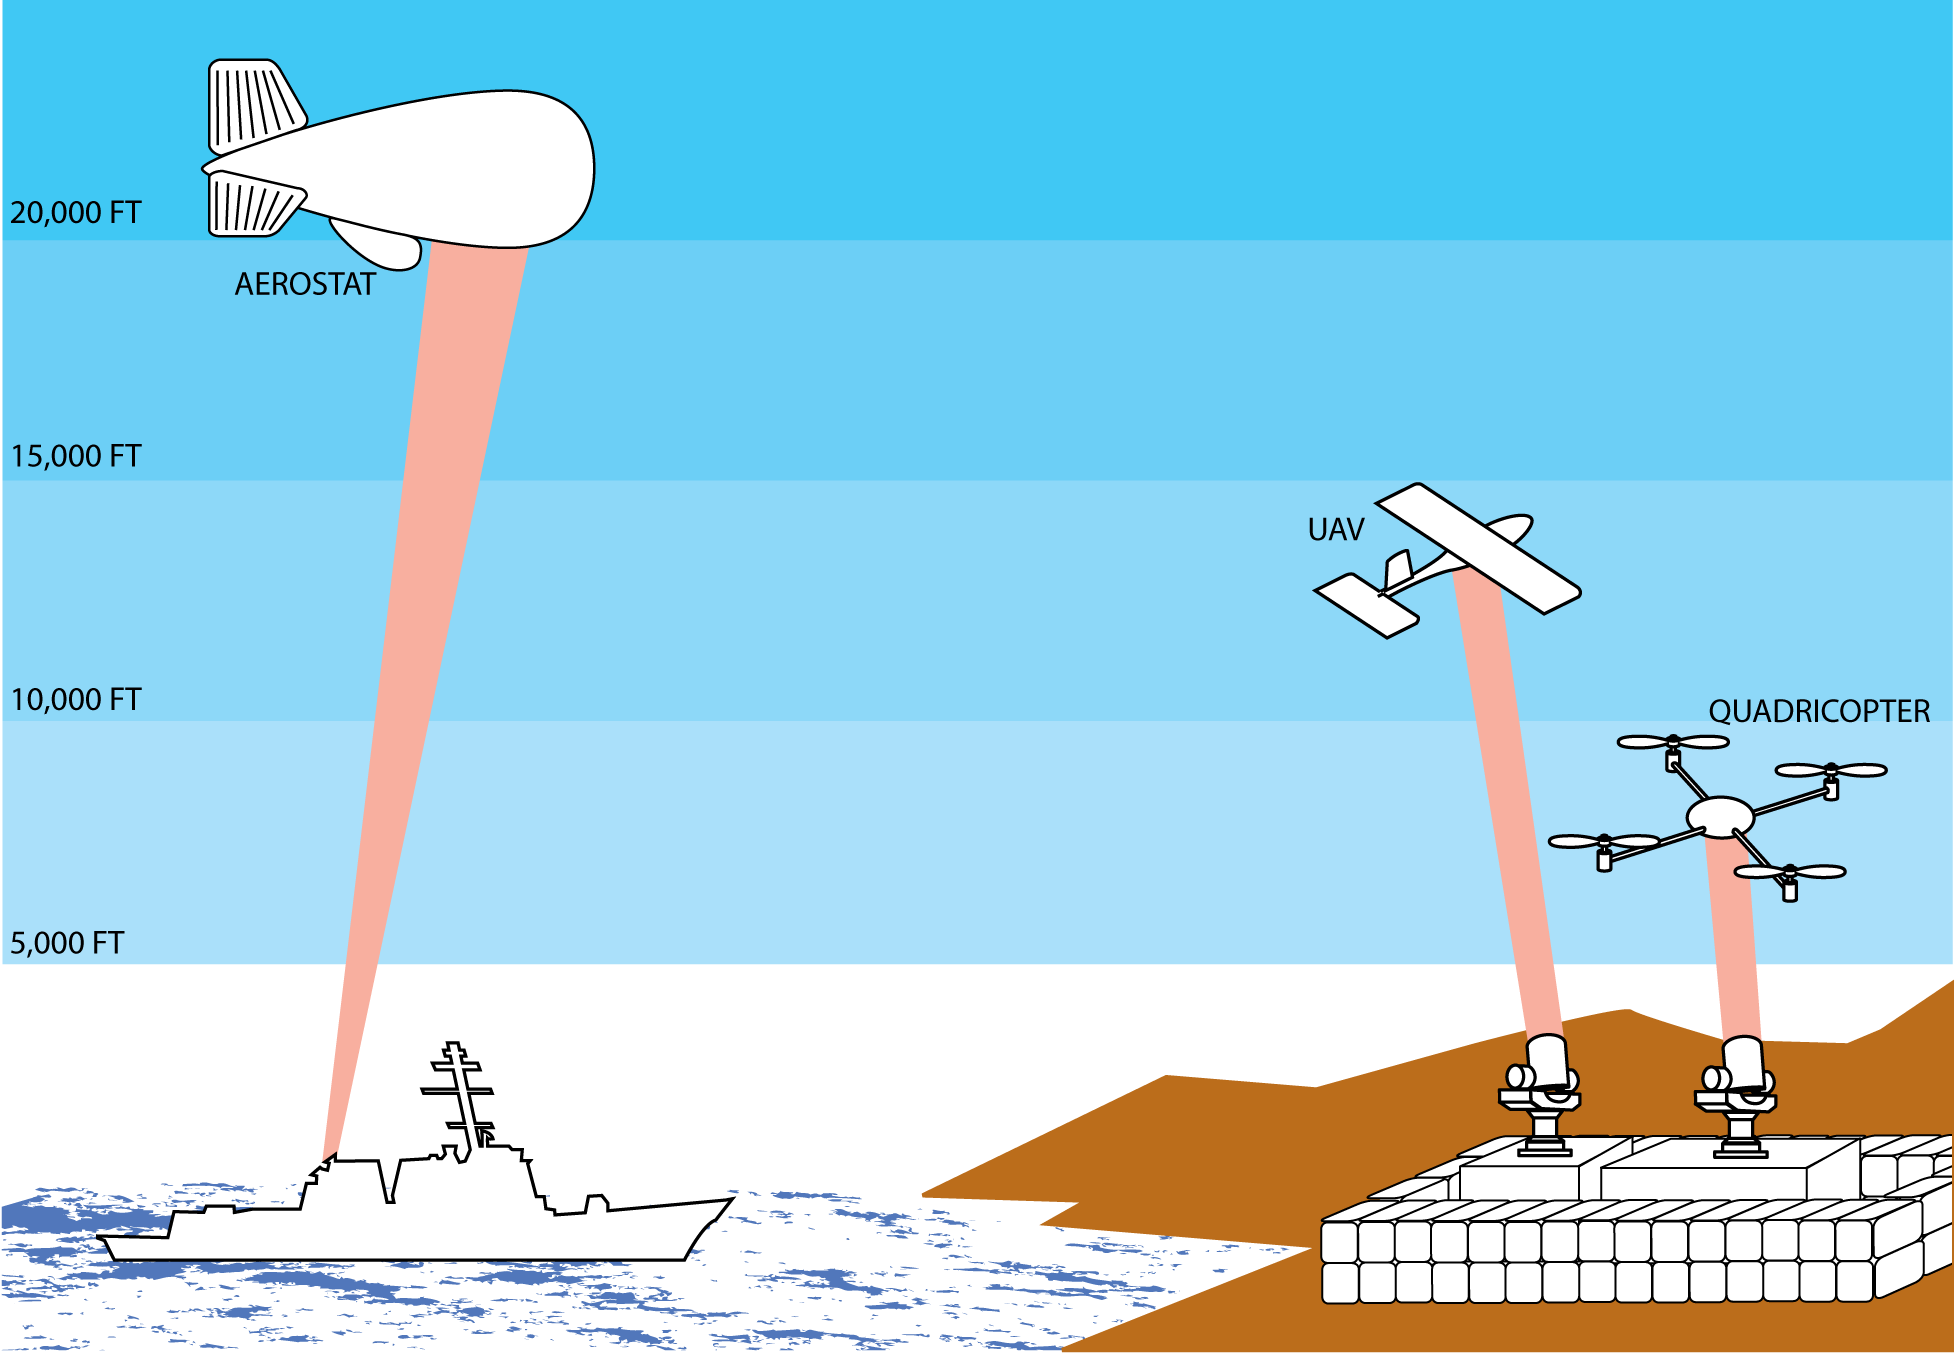 HighAltitude-UAVs.png